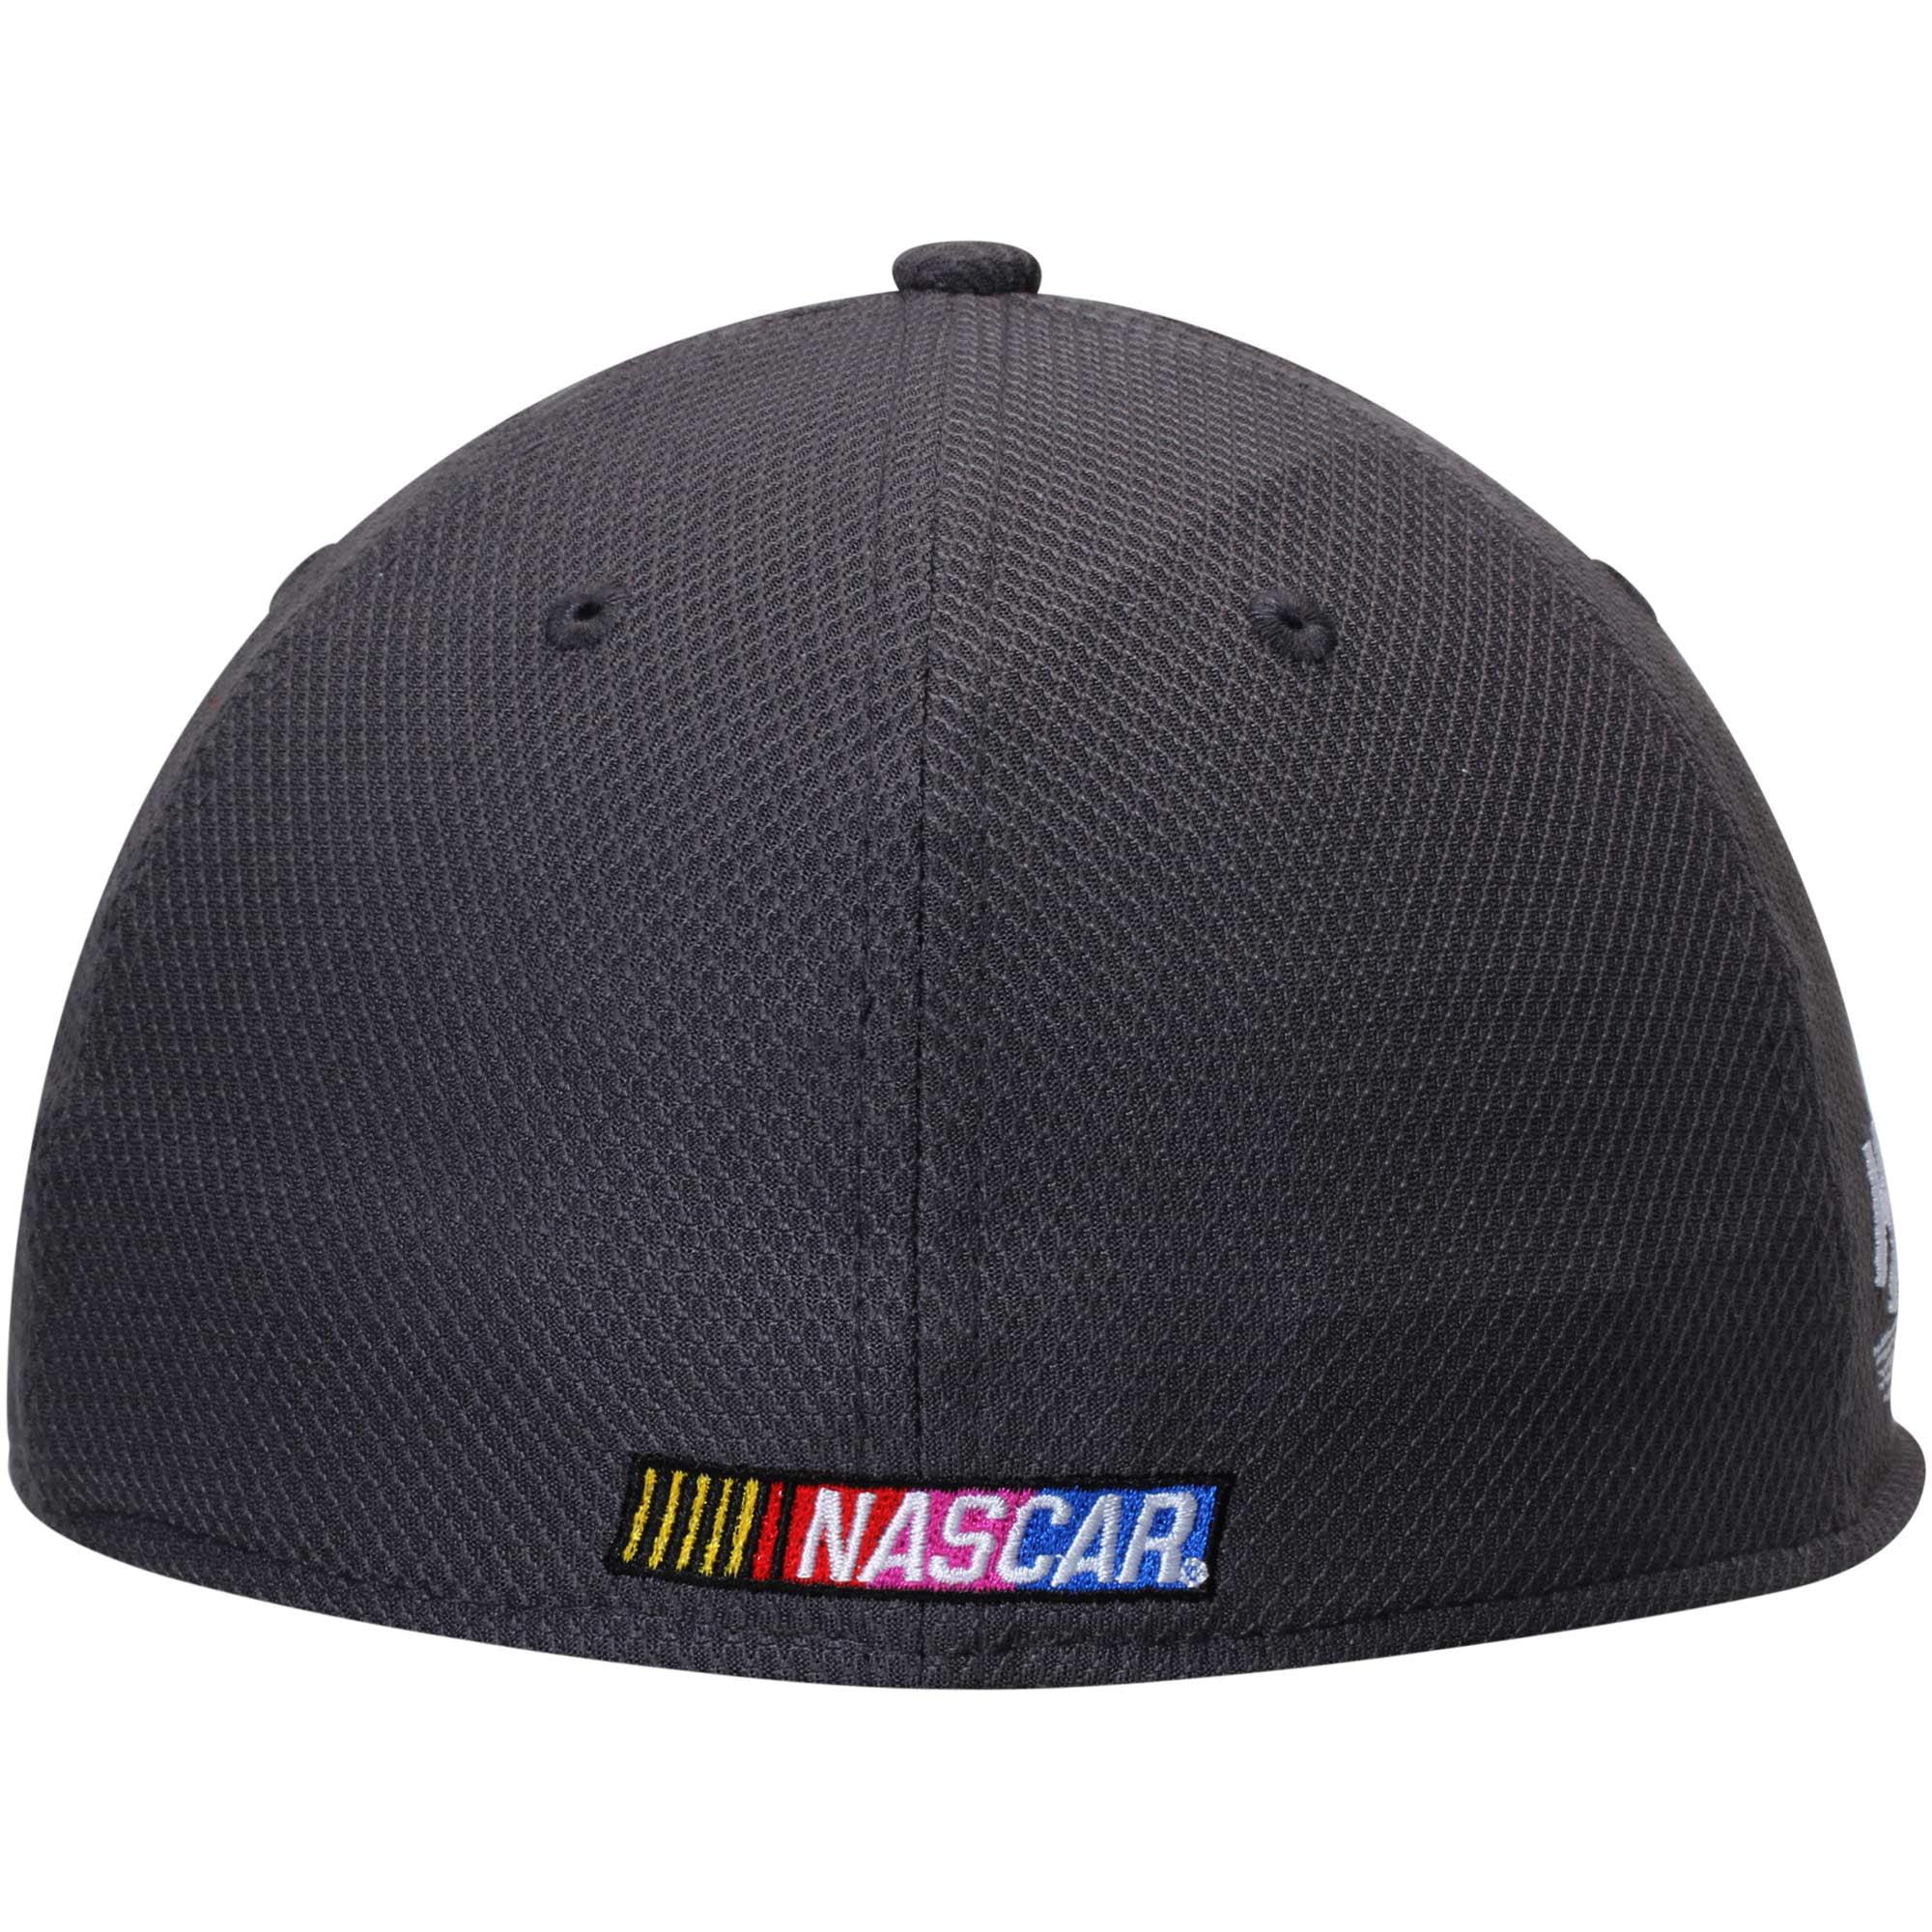 Dale Earnhardt Jr. New Era Alternate Driver 39THIRTY Flex Hat - White Gray  - Walmart.com 7a15032f051a